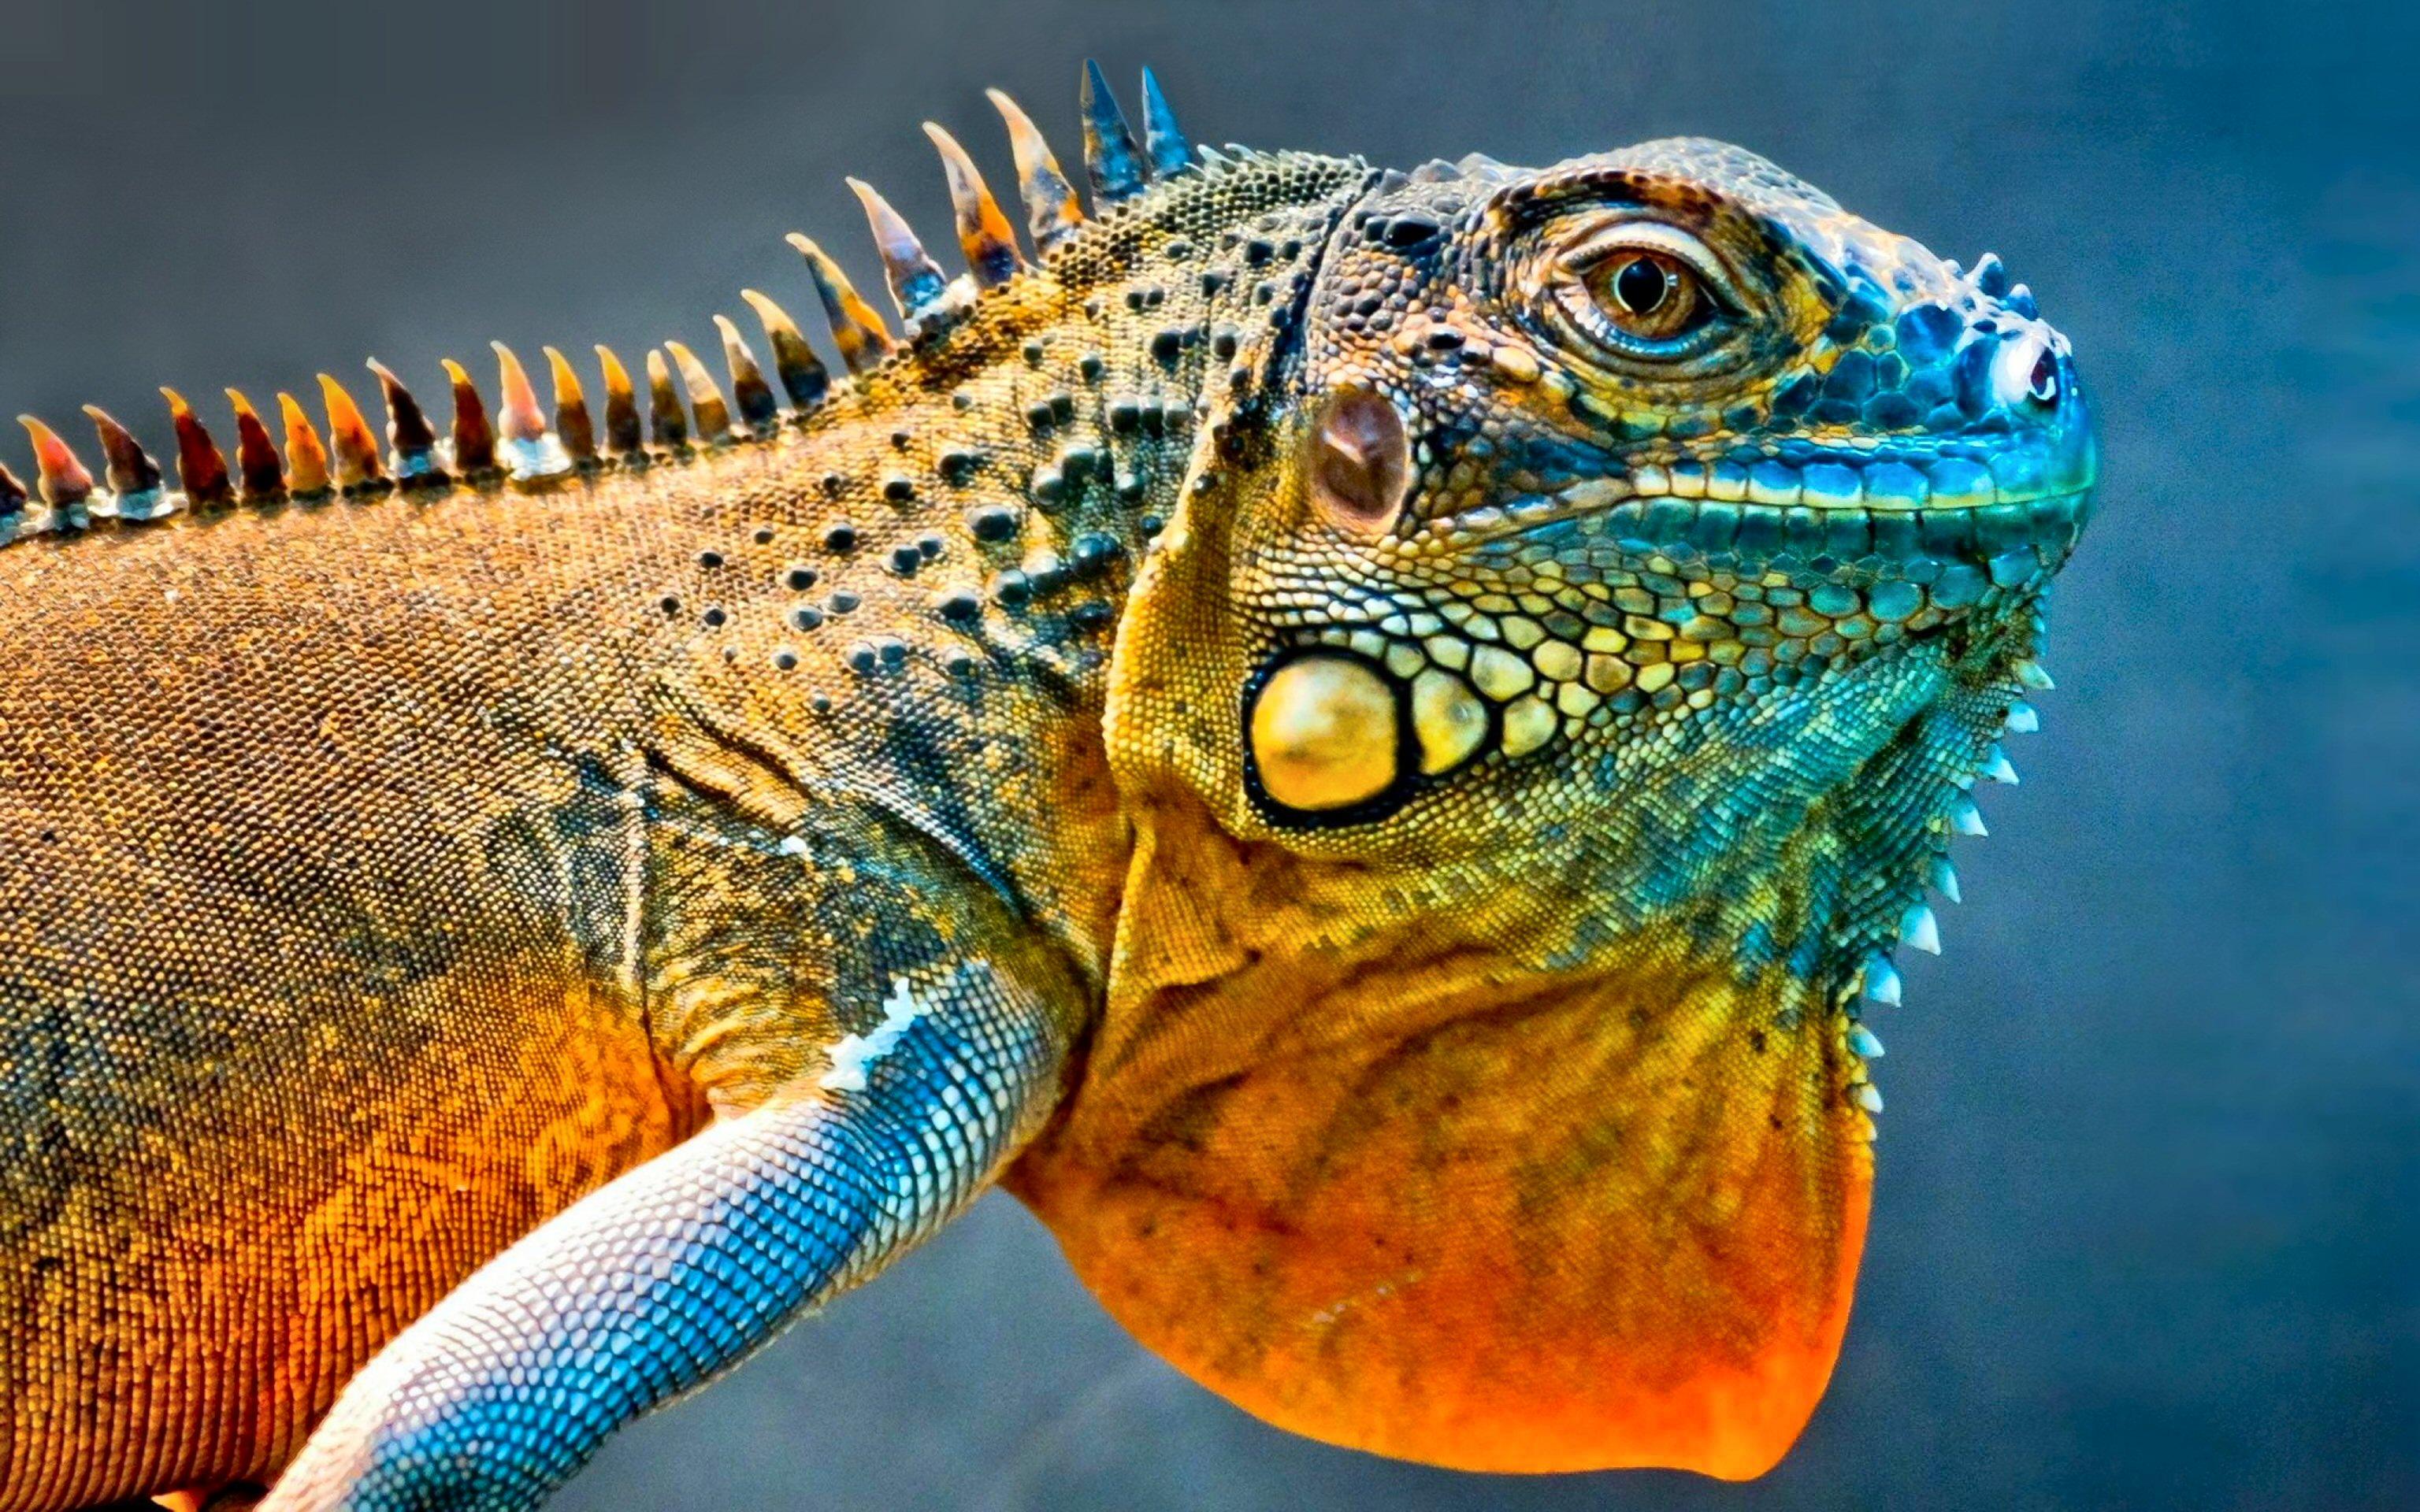 320 Lizard HD Wallpapers Backgrounds Wallpaper Abyss